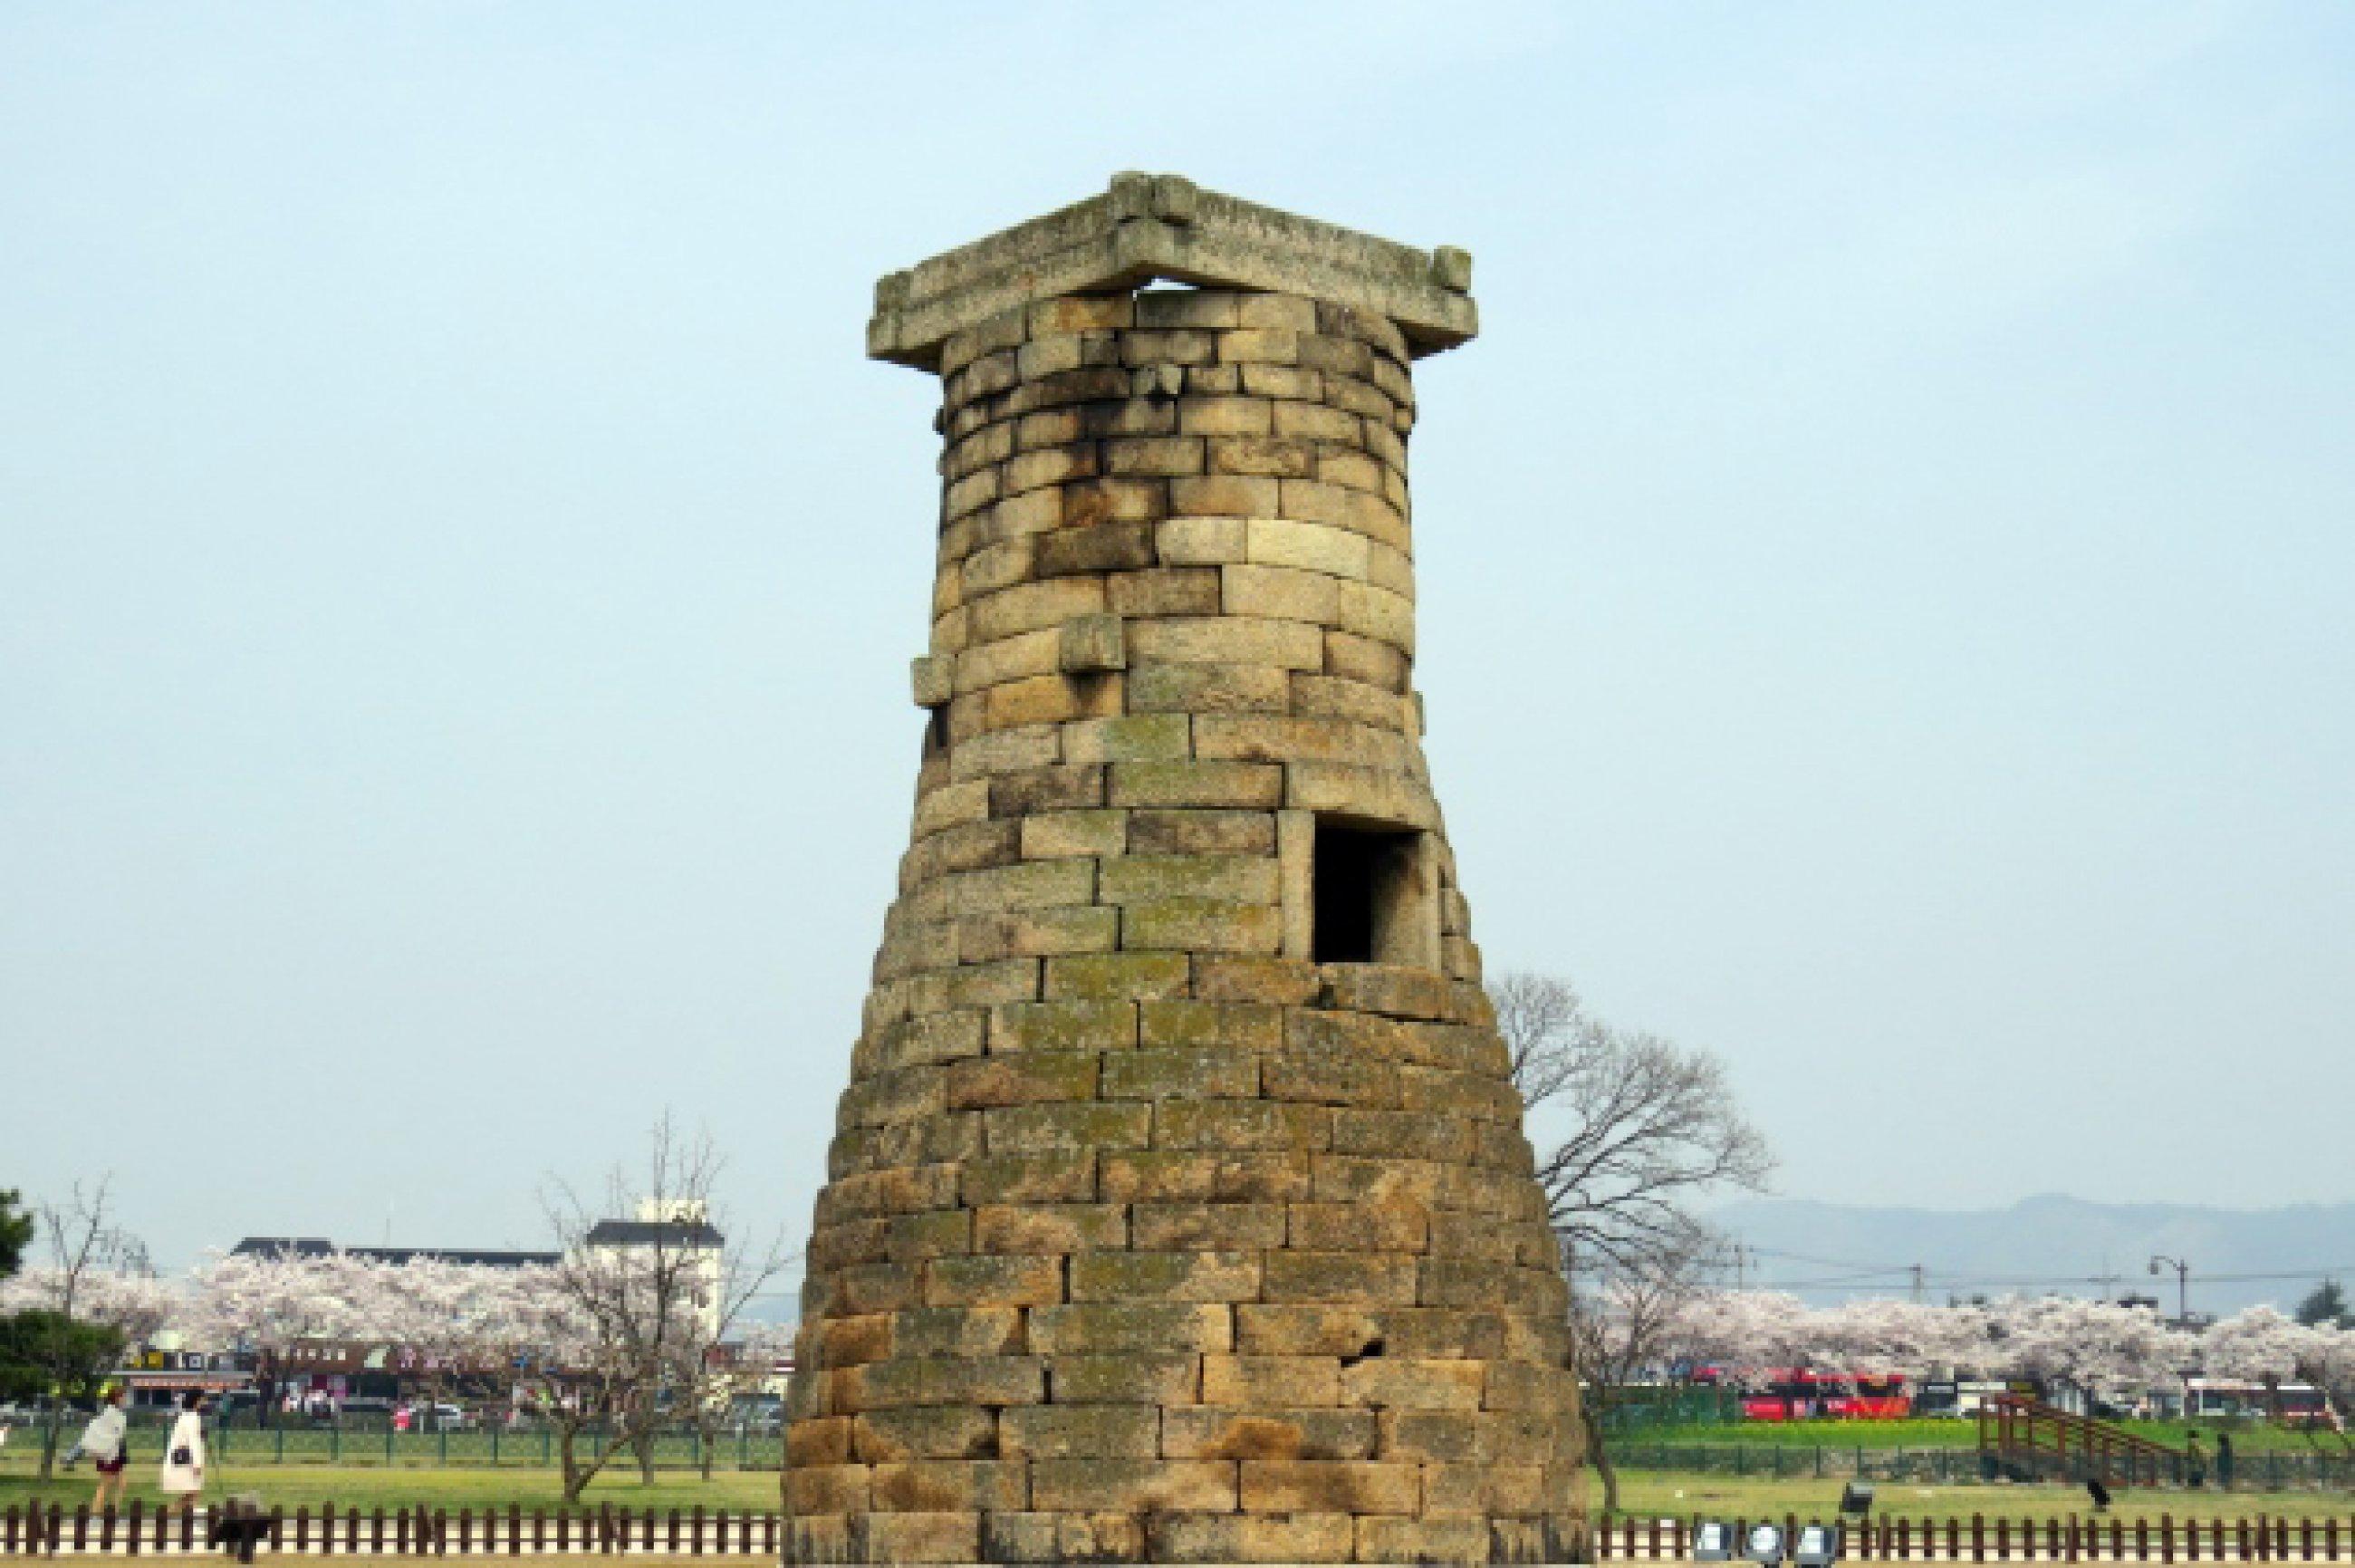 https://bubo.sk/uploads/galleries/7452/cheomseongdae-the-oldest-observatory-astronomical-observatory-east-asin-in-gyeongju-south-korea-the-31st.-national-treasure-of-korea.jpg